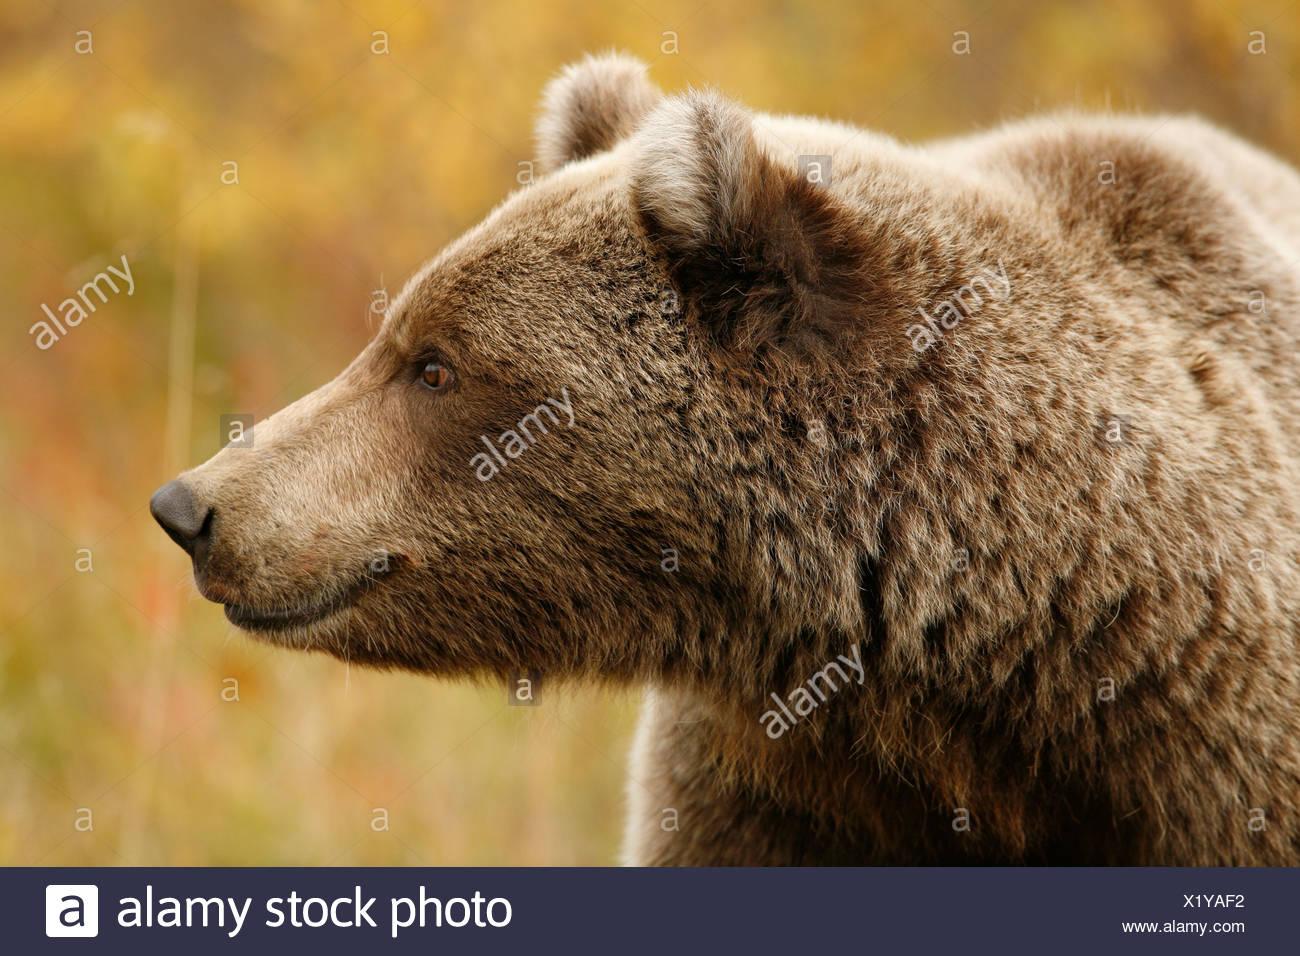 Grizzly Bear, Ursus arctos, fall, feeding, alpine tundra, Denali National Park, Alaska. - Stock Image